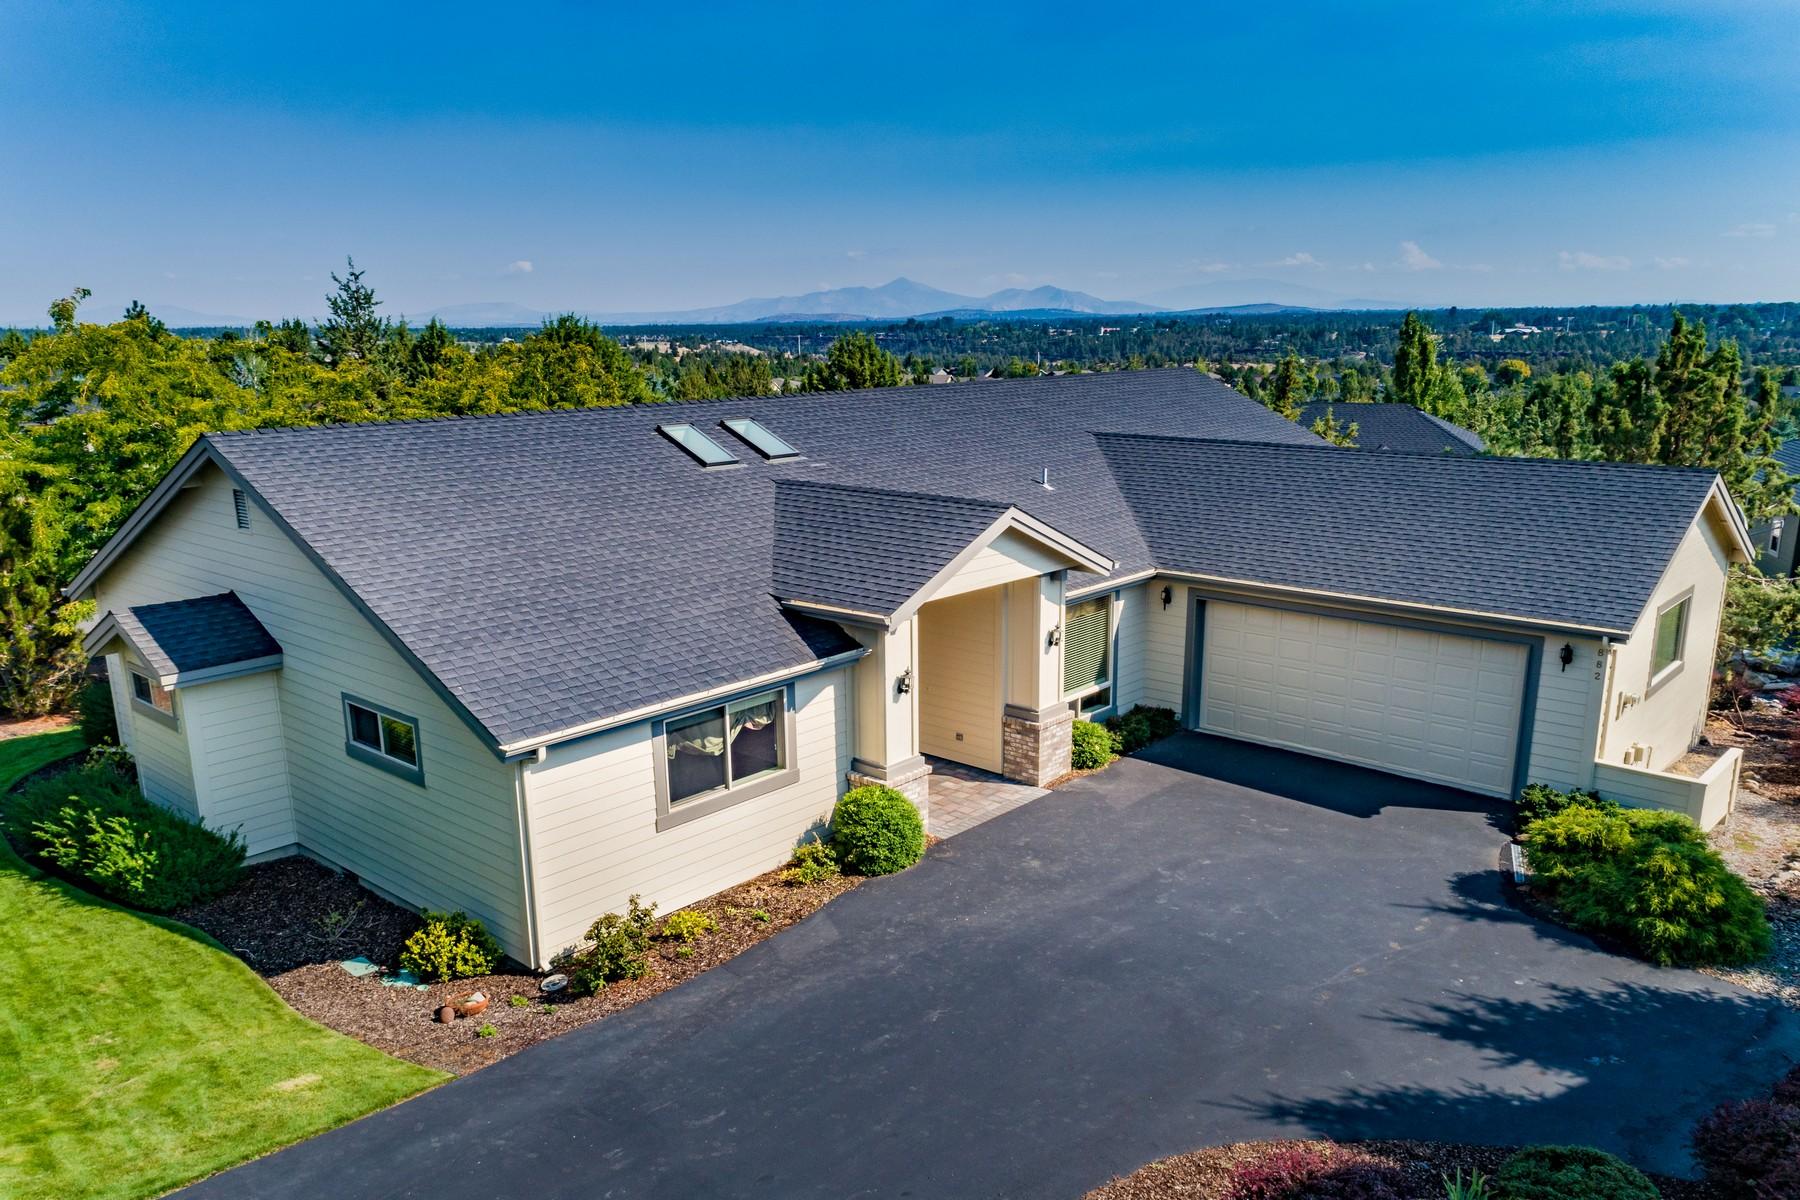 Other Residential Homes για την Πώληση στο 882 Sacred Falls Drive Redmond, OR 97756 Redmond, Ορεγκον 97756 Ηνωμένες Πολιτείες